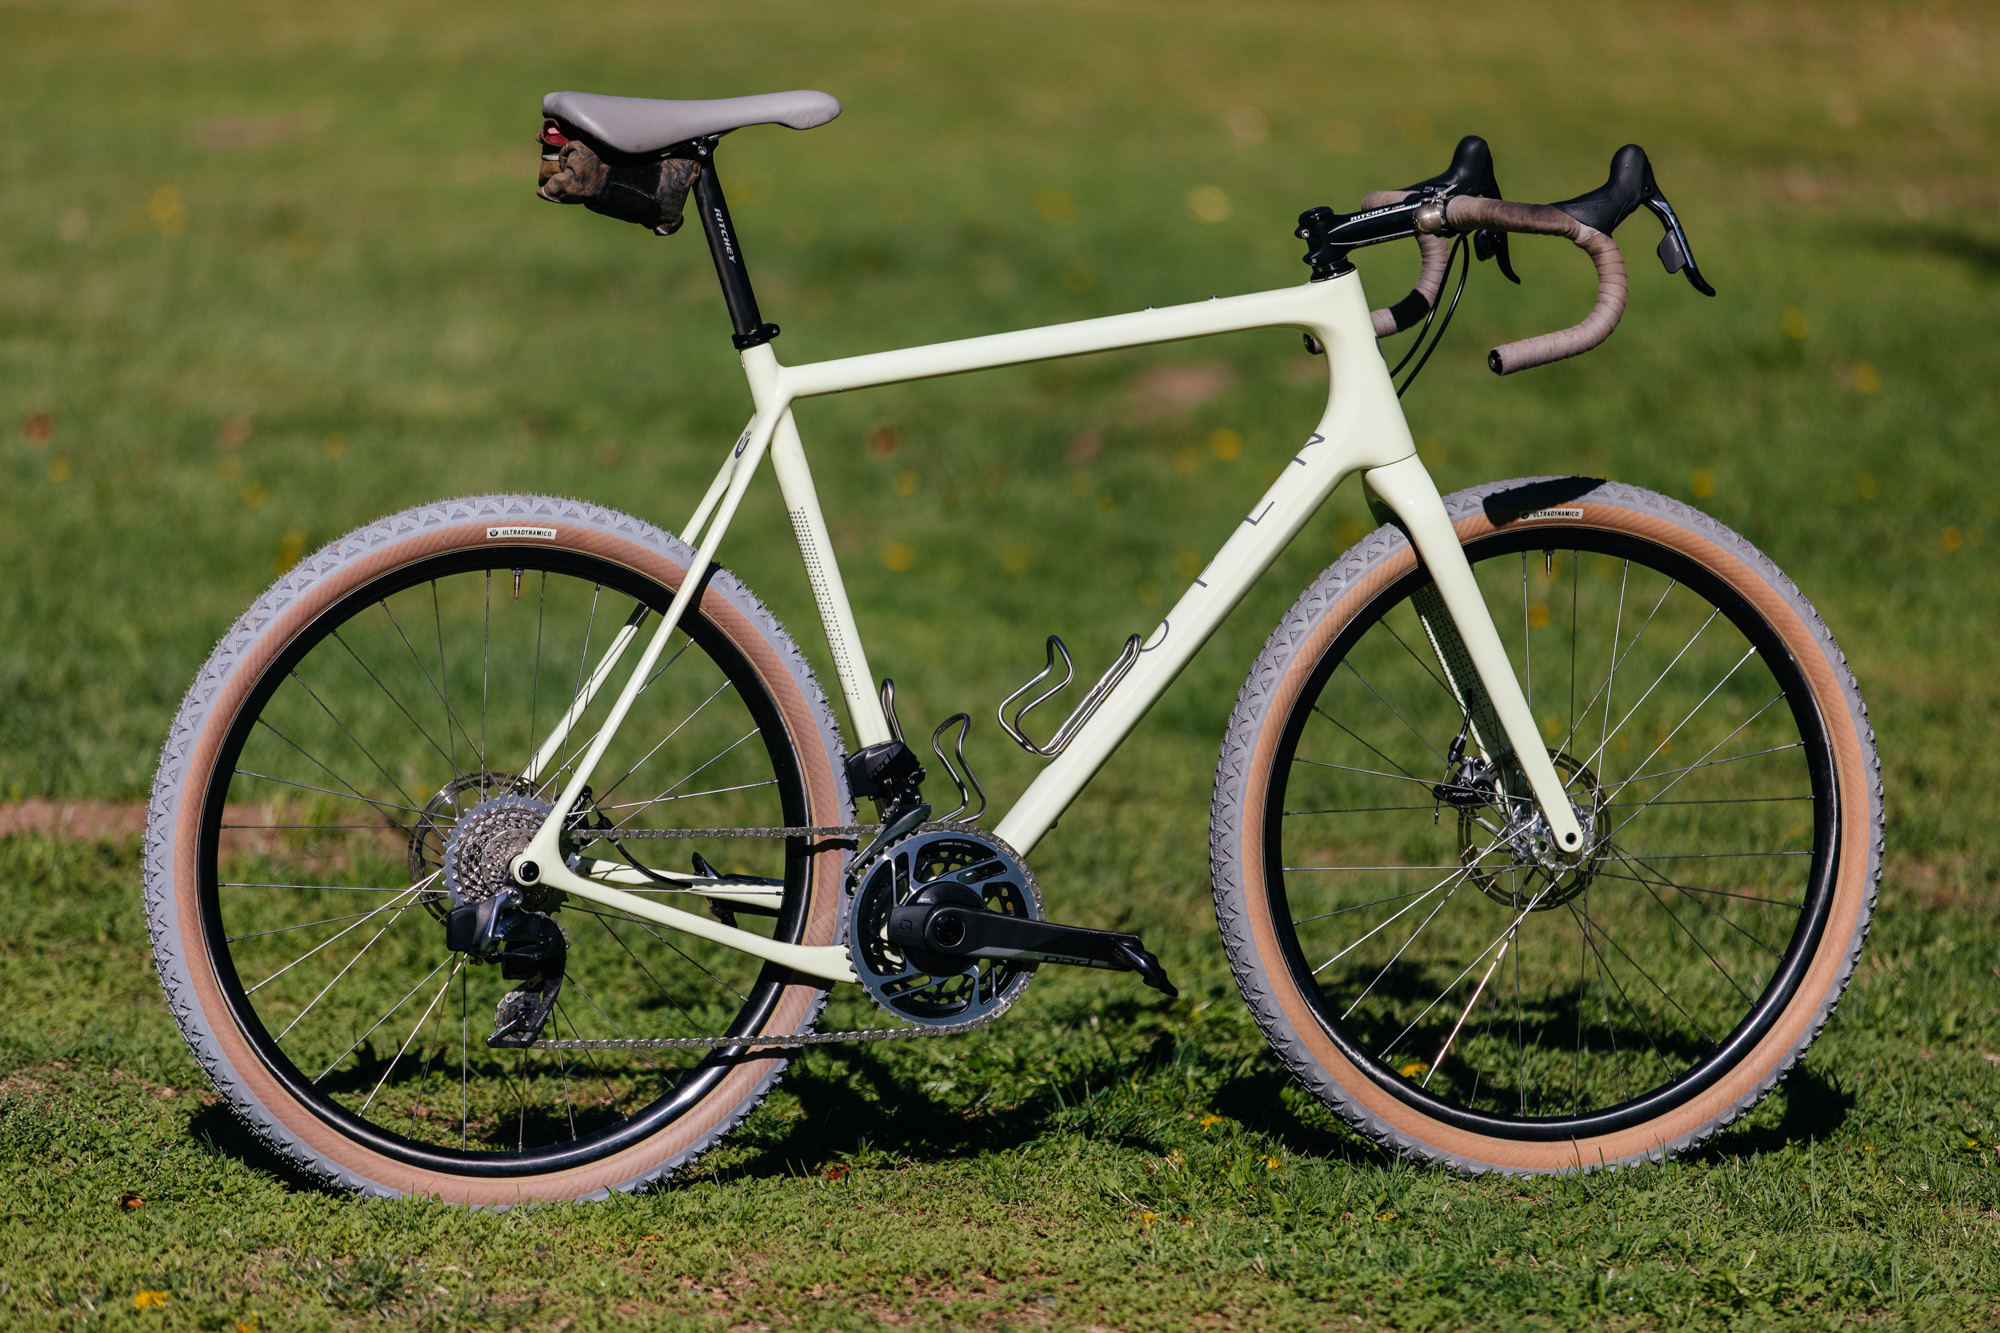 Grinduro 2019: Patrick's Ultradynamico Rosé OPEN UP Gravel Race Bike